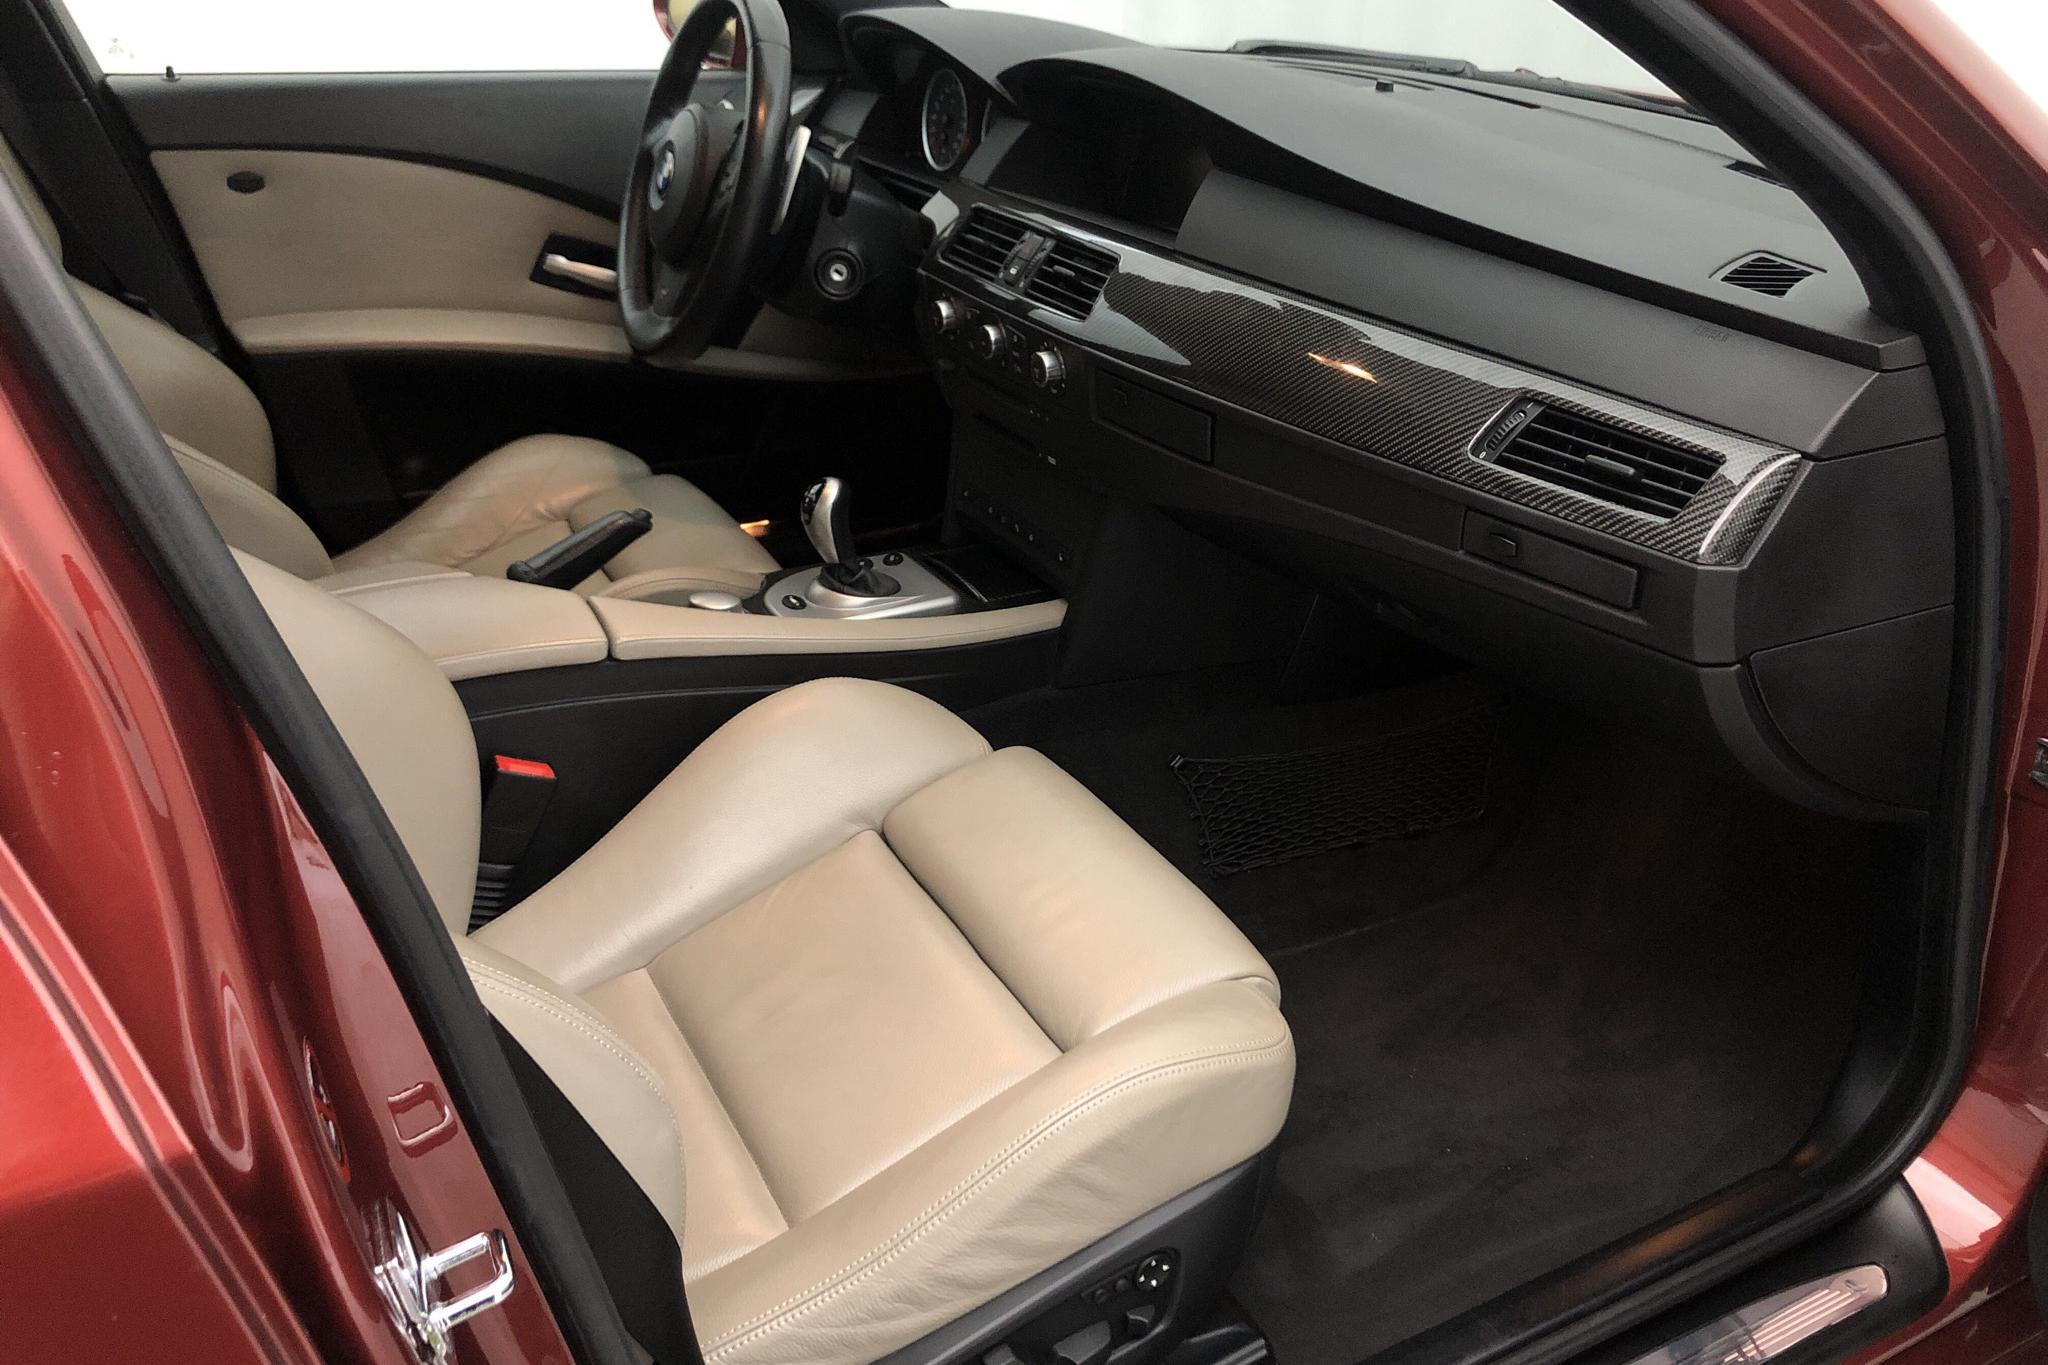 BMW M5 Sedan, E60 (507hk) - 10 280 mil - Automat - röd - 2005